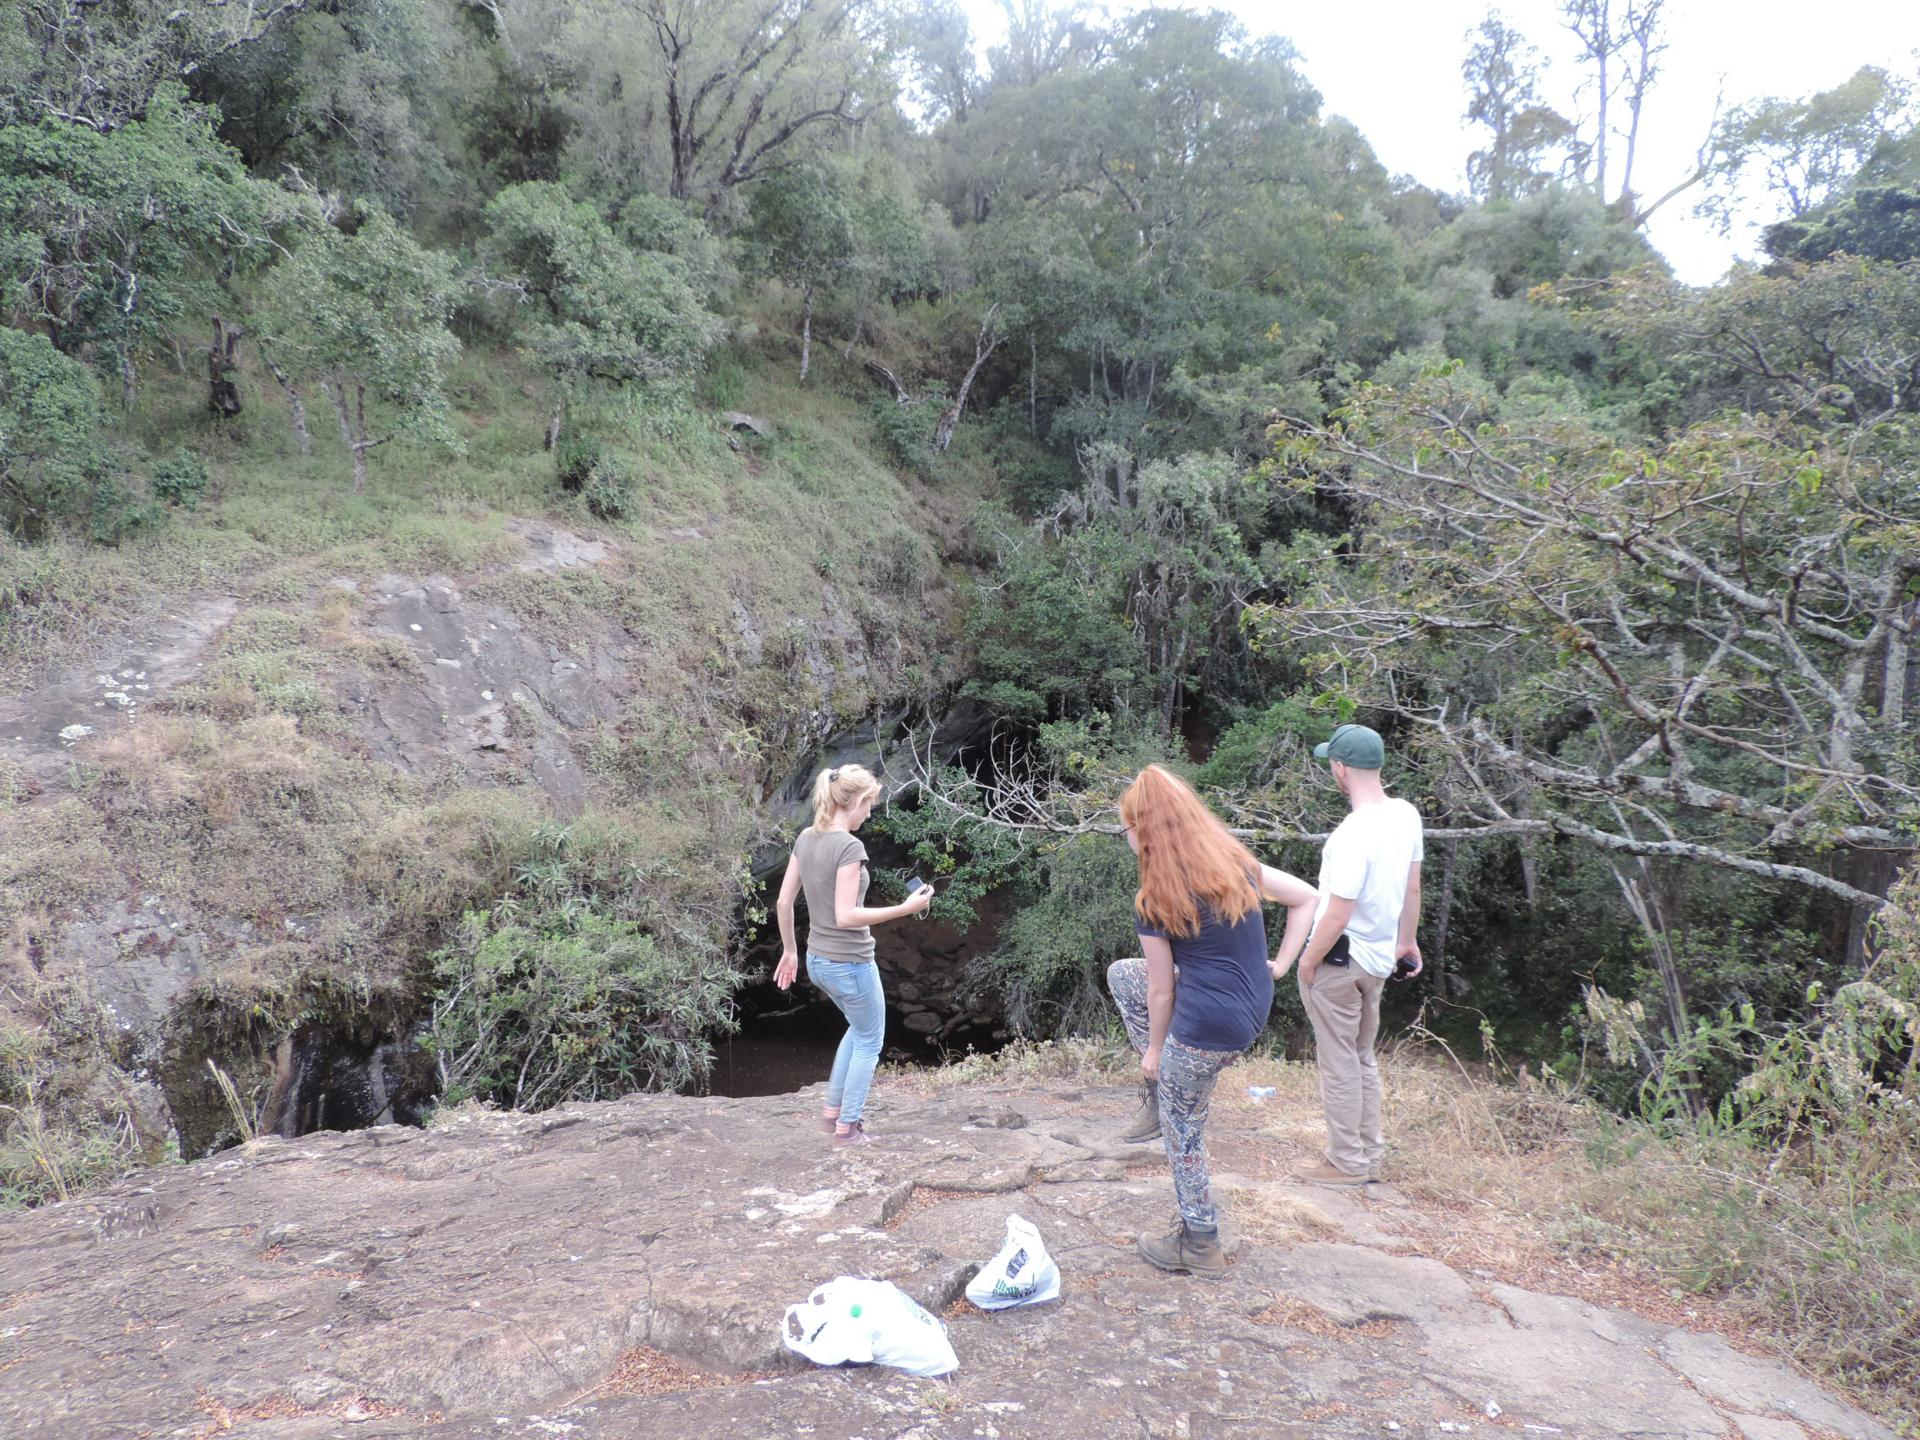 Maumau Caves, trekking trips Kenya, climbing mount Kenya, climbing Mount Kenya in Kenya, mount Kenya hiking, walking, route, trekking routes, yha Kenya travel, photos